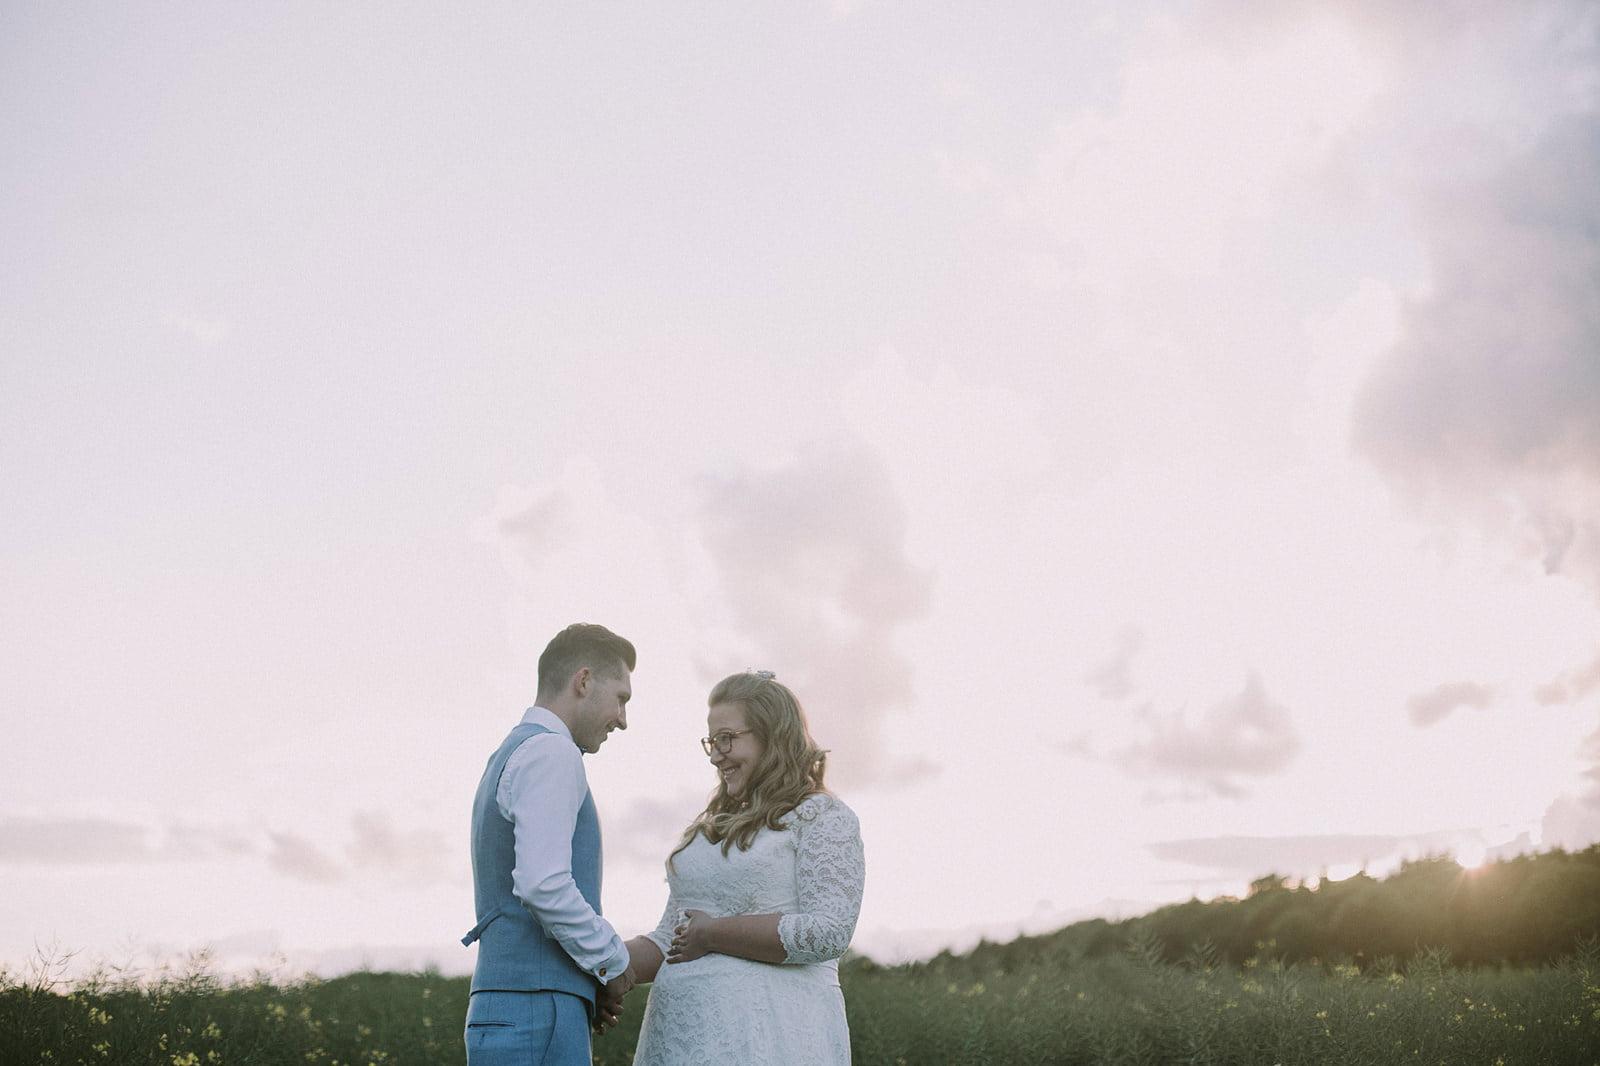 wedding photographer swallows nest barn warwickshire